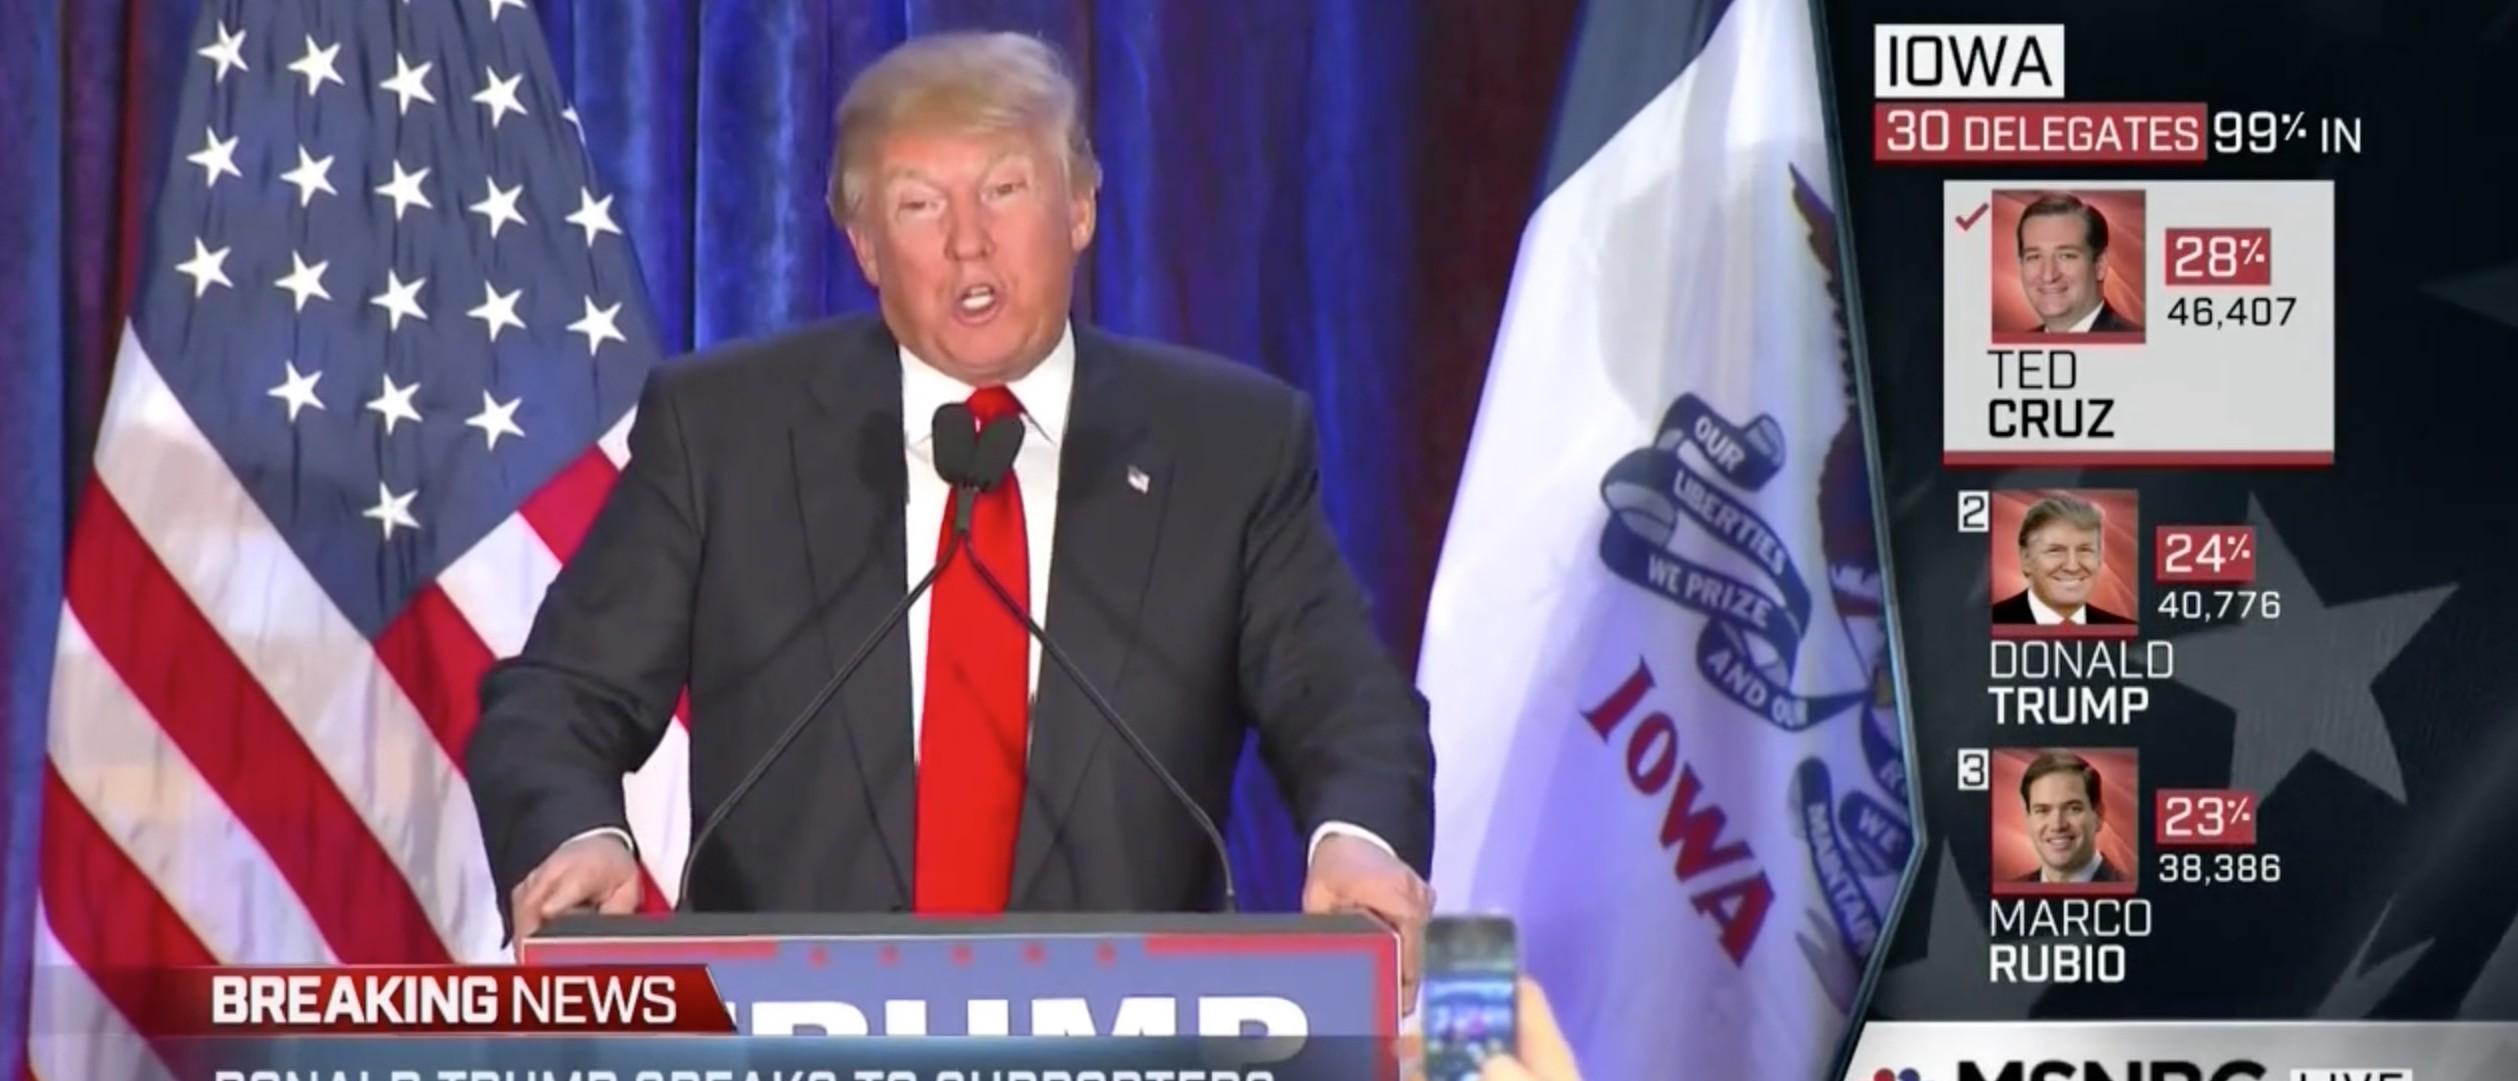 Watch Donald Trump's Post Iowa Caucus Speech [screen shot MSNBC]